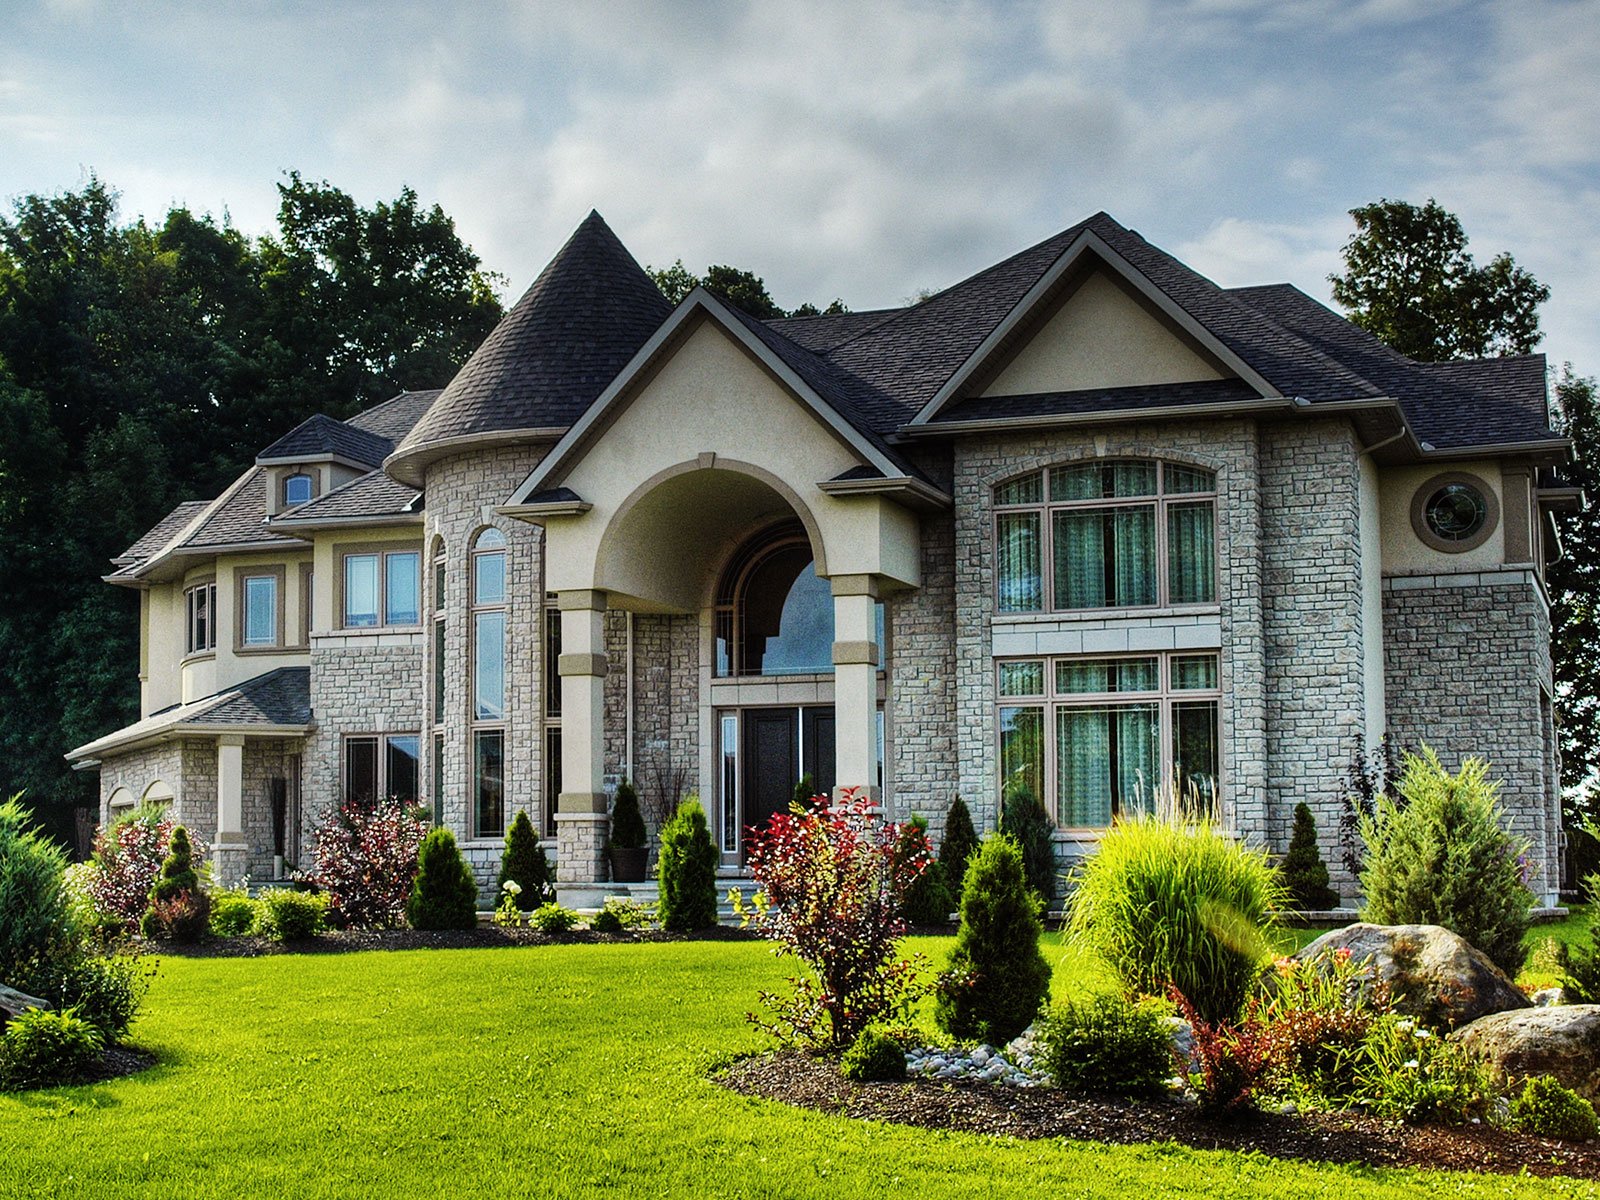 Mesmerizing Create Your Dream House Images Design Ideas